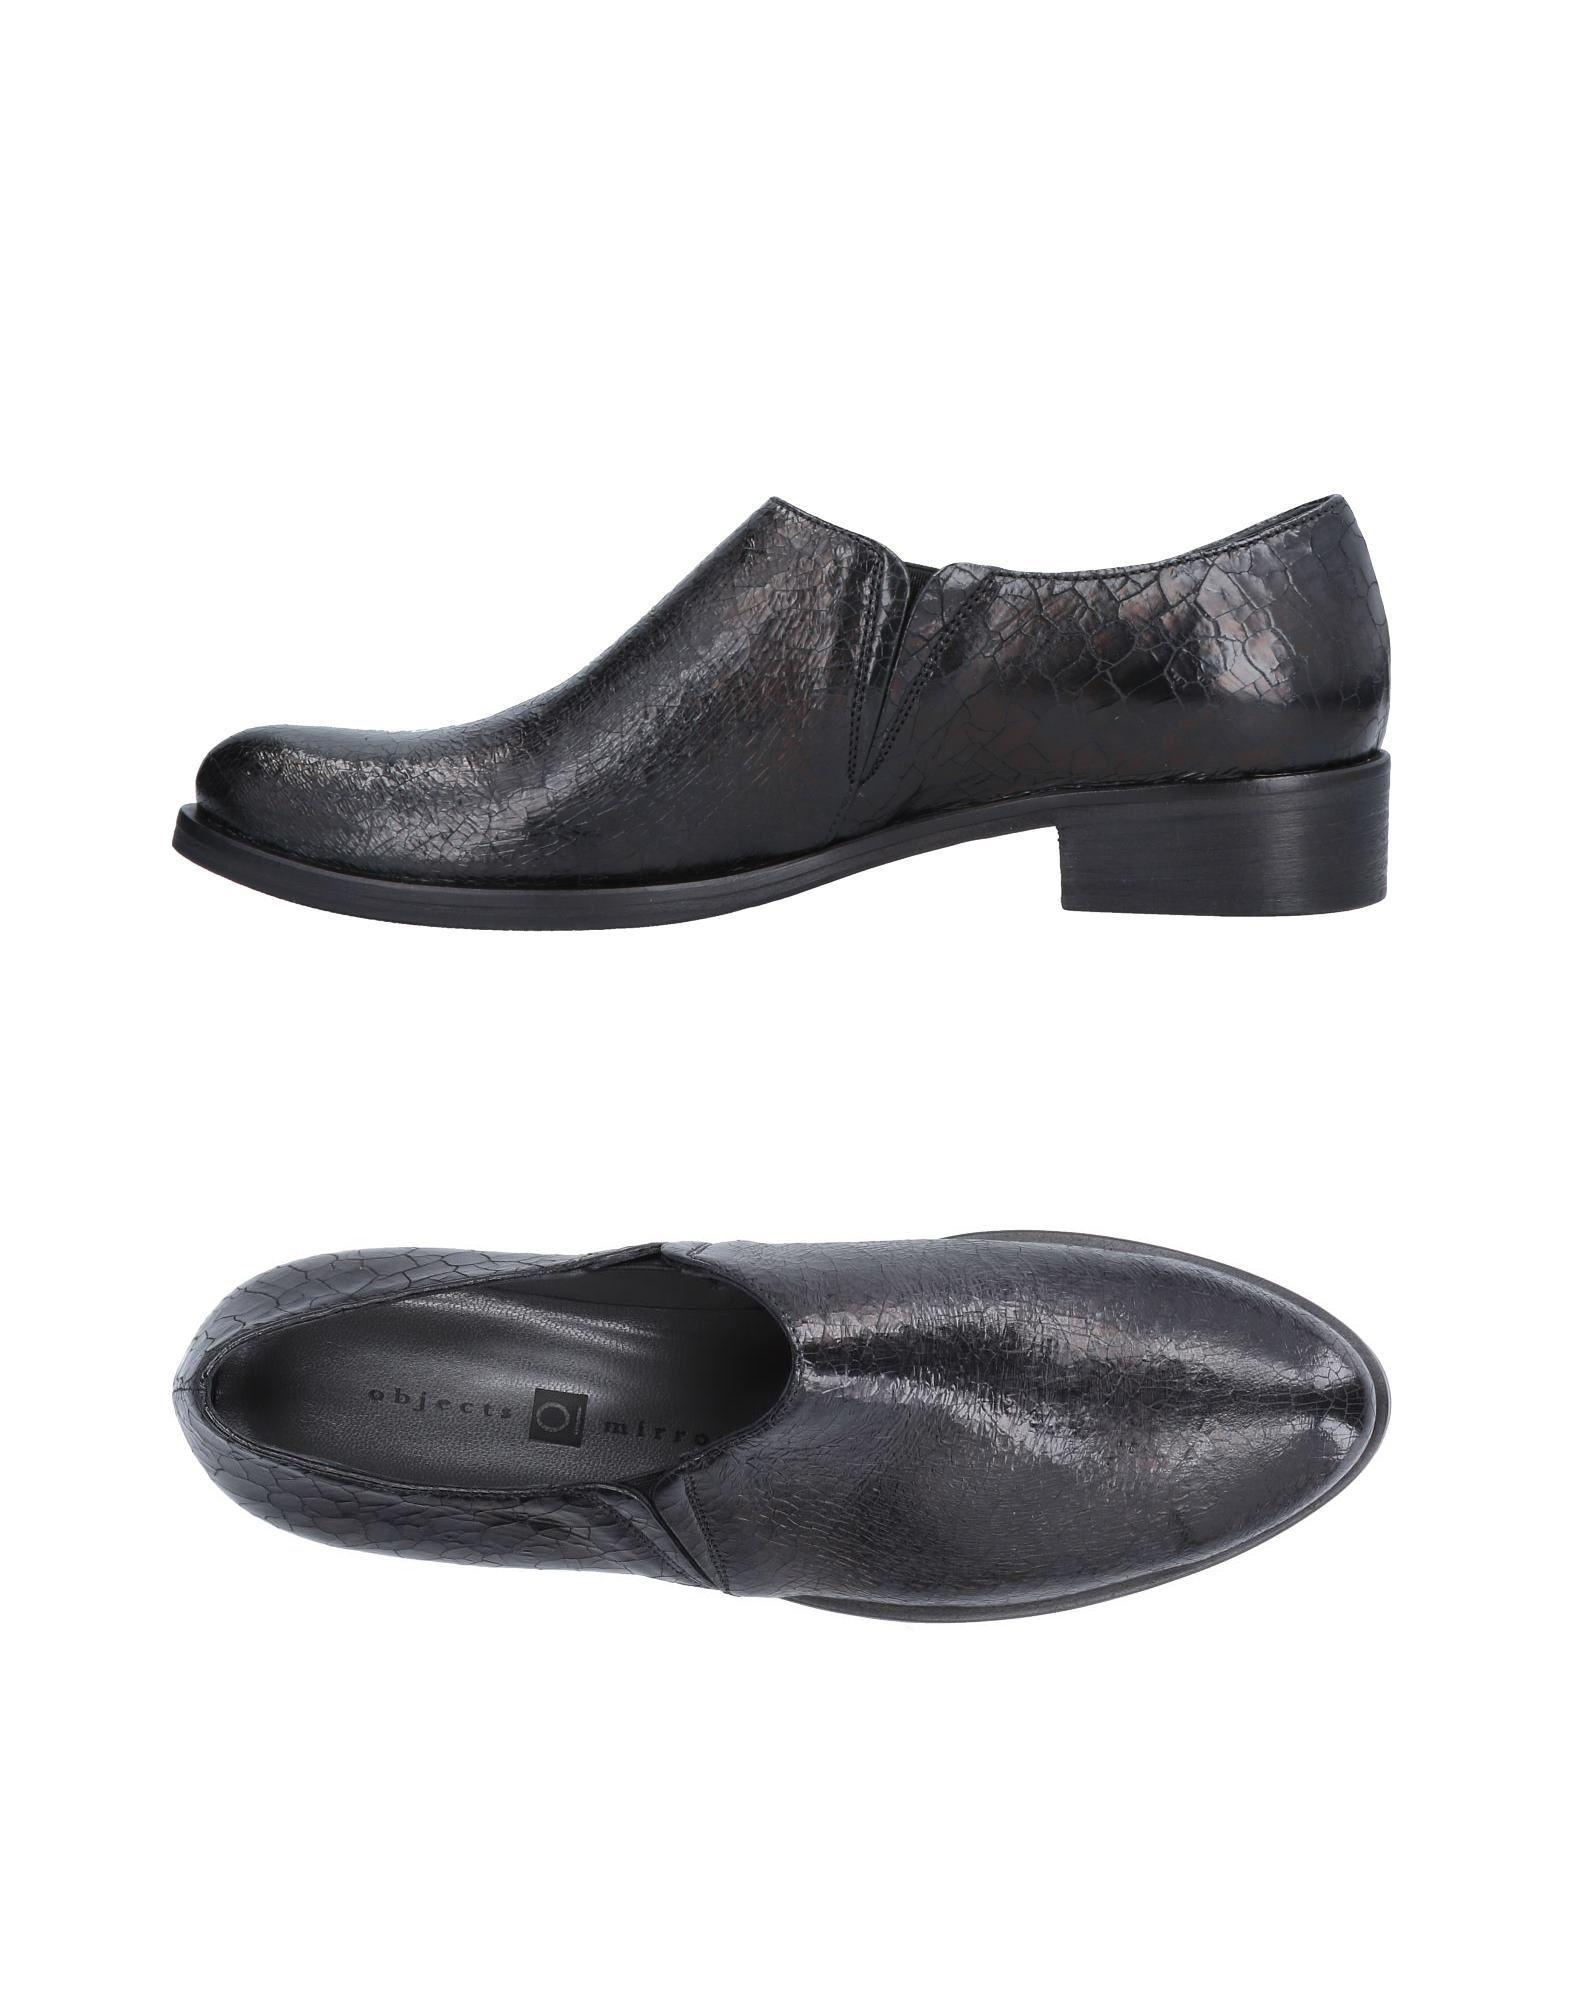 Sneakers Superga® Donna - scarpe 11462703BA Nuove offerte e scarpe - comode 79c917